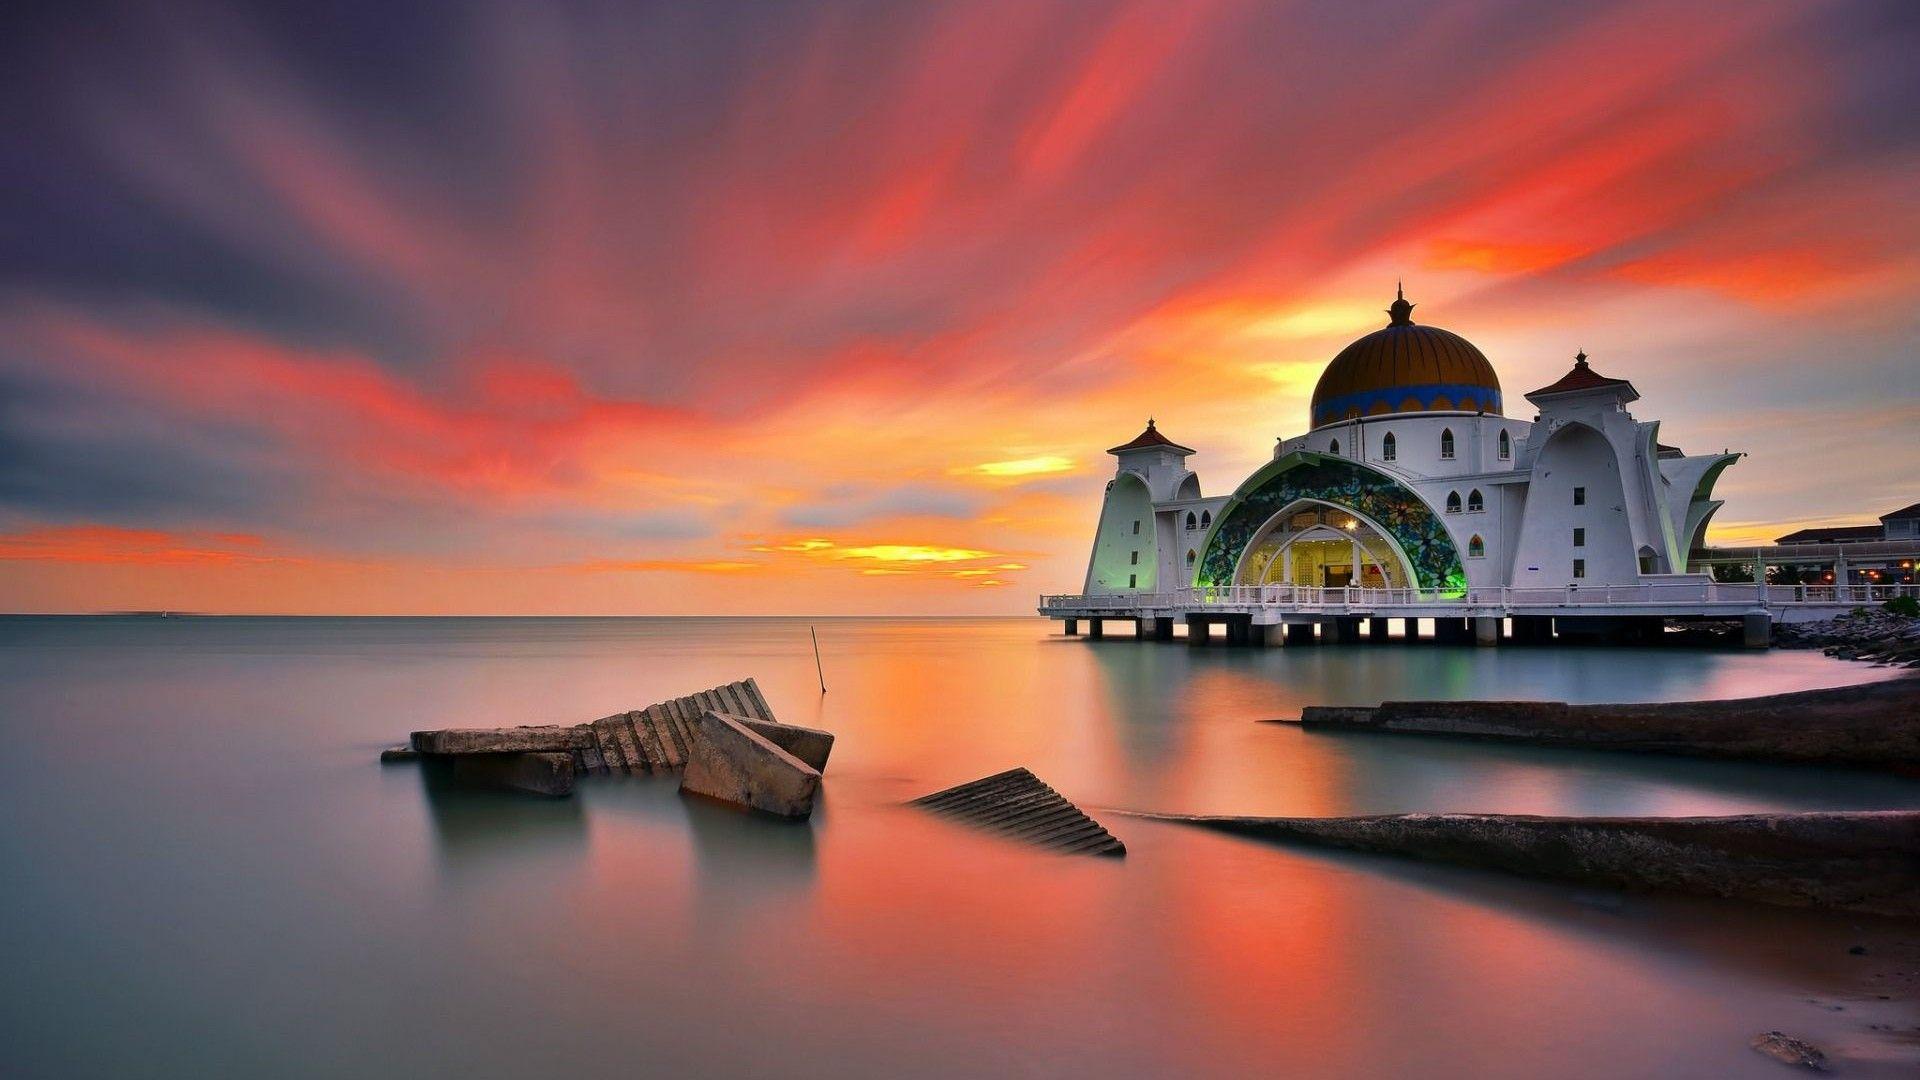 3d Wallpaper Of Madina Full Hd Selat Melaka Mosque Malaysia Desktop Wallpaper